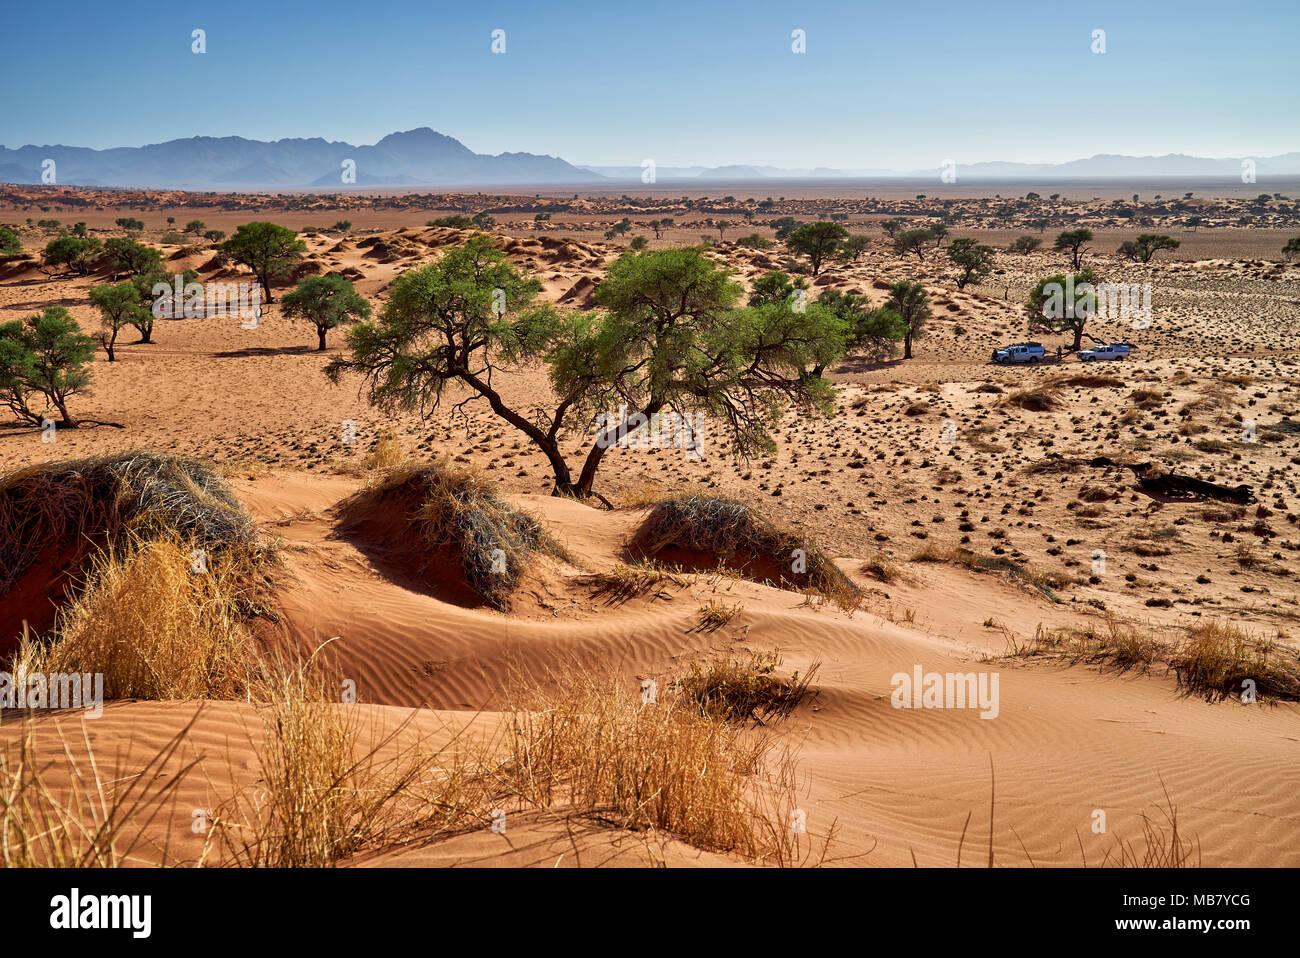 deserted landscape of NamibRand Nature Reserve, Namibia, Africa - Stock Image